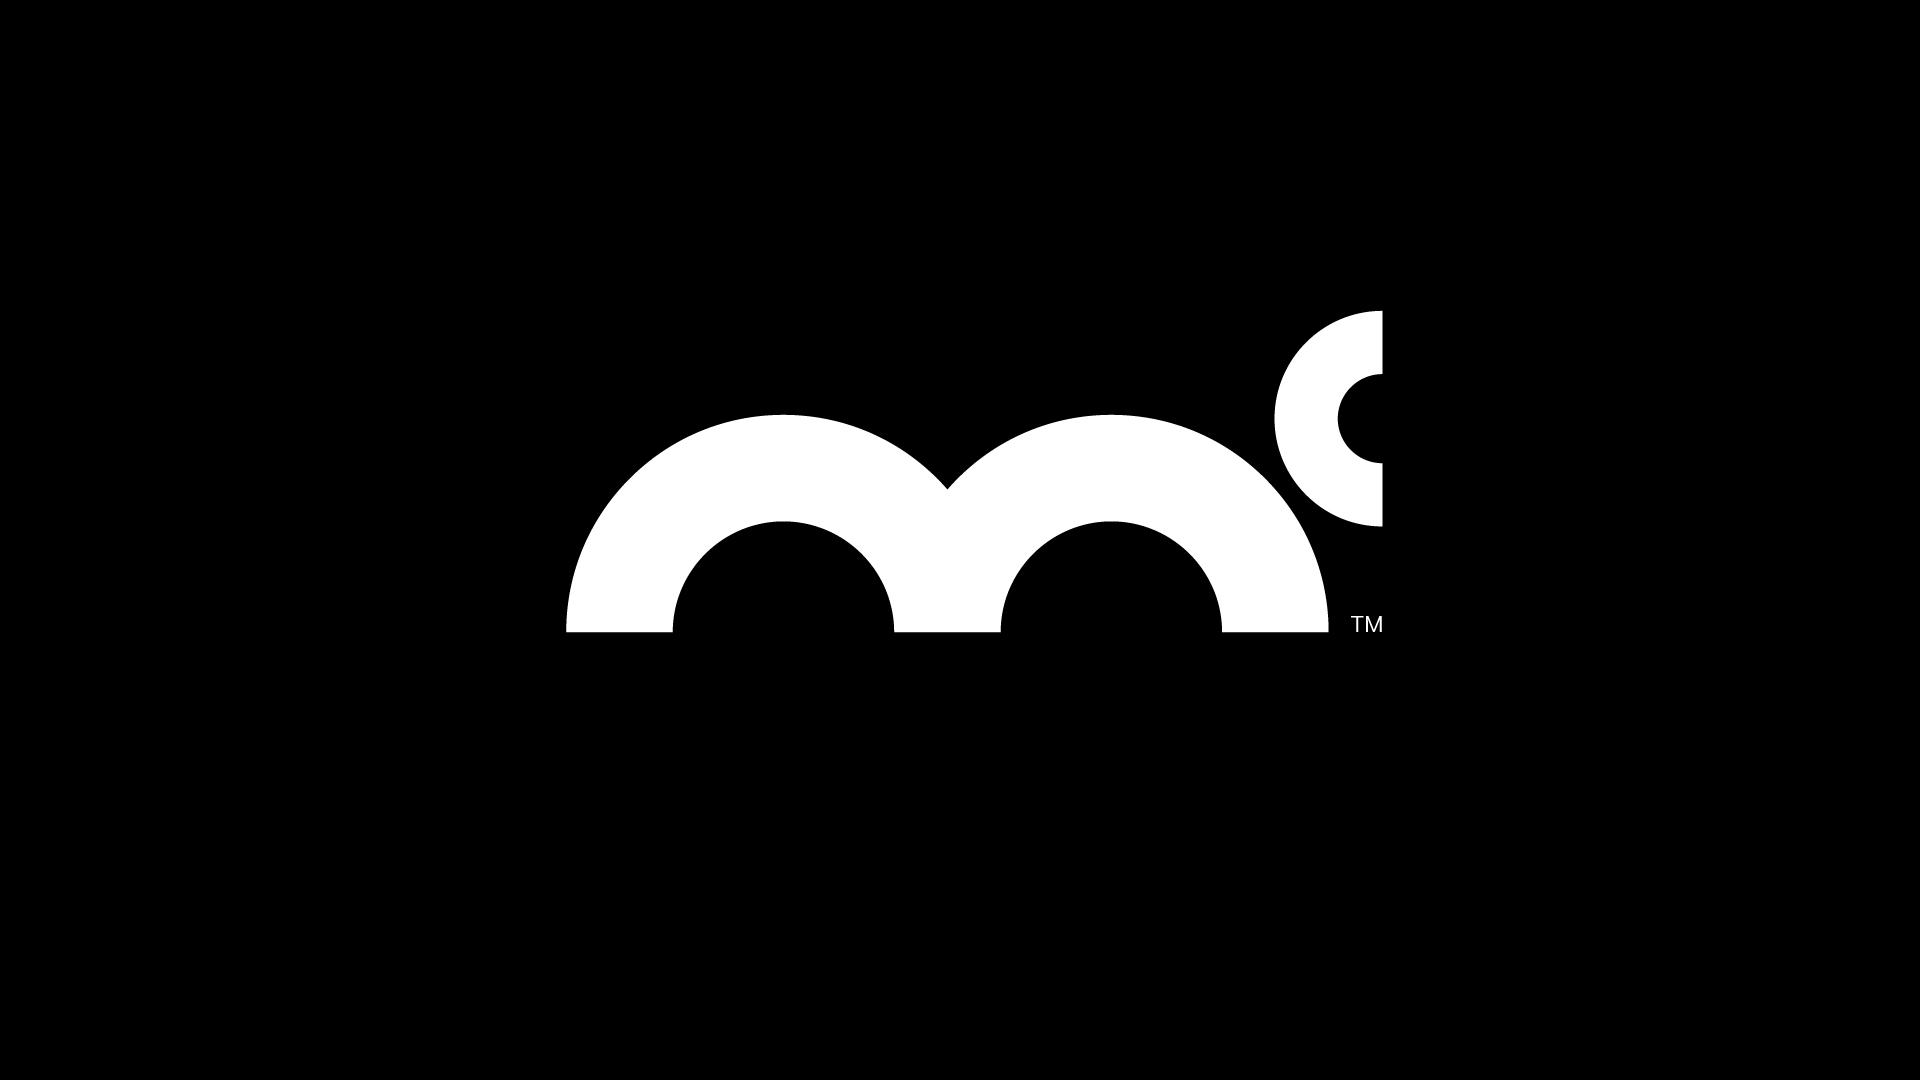 """Mc"" logo."